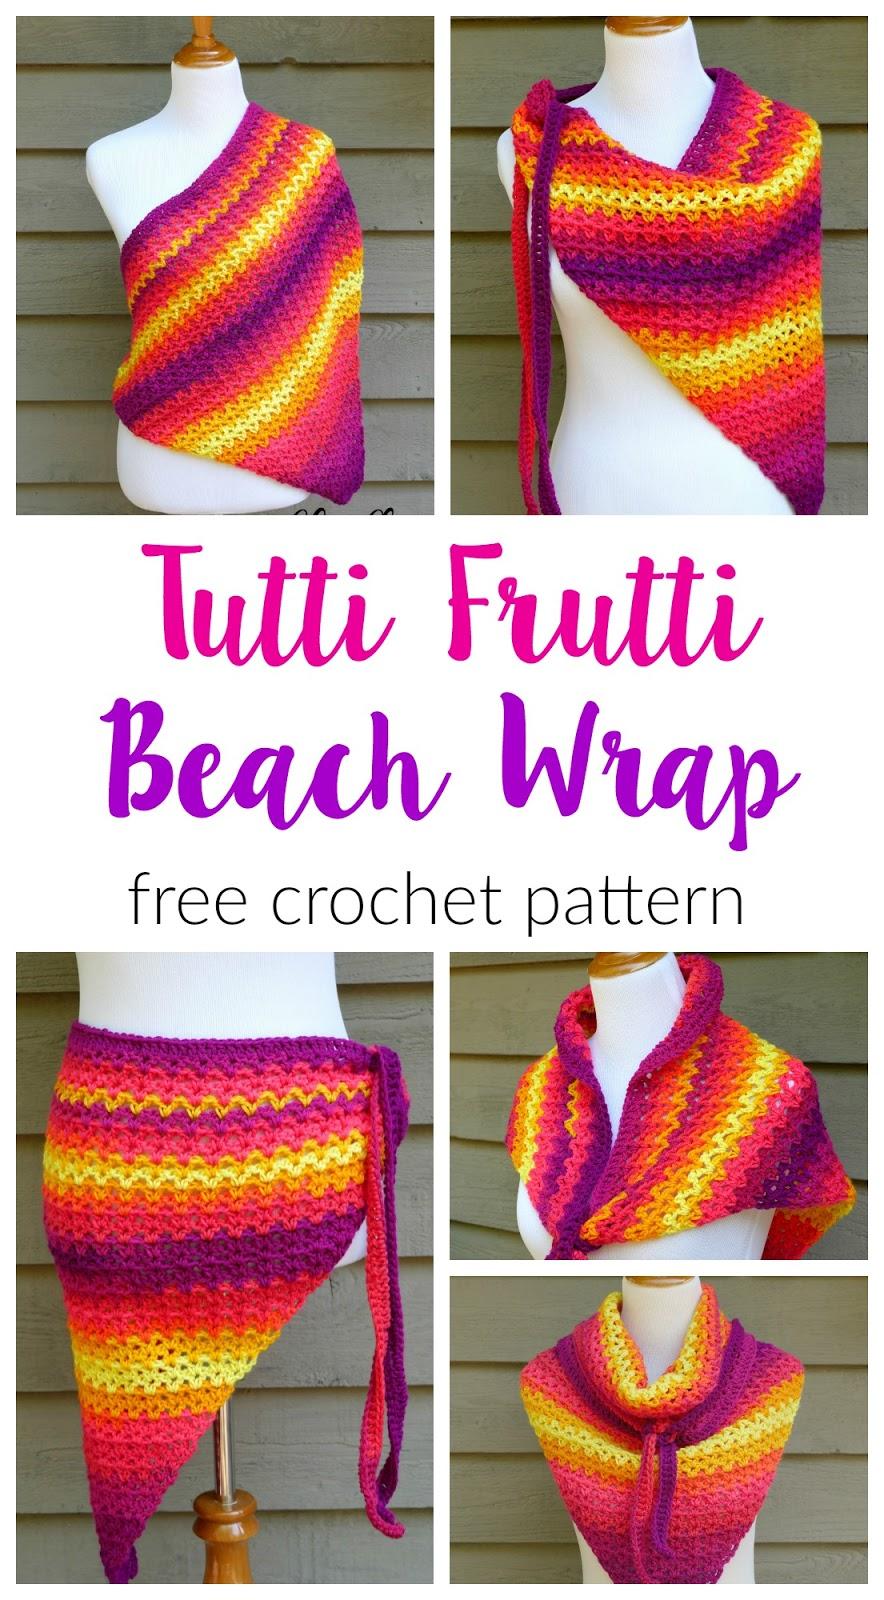 Favorite Fiber Flux: Free Crochet PatternTutti Frutti Beach Wrap! AX18